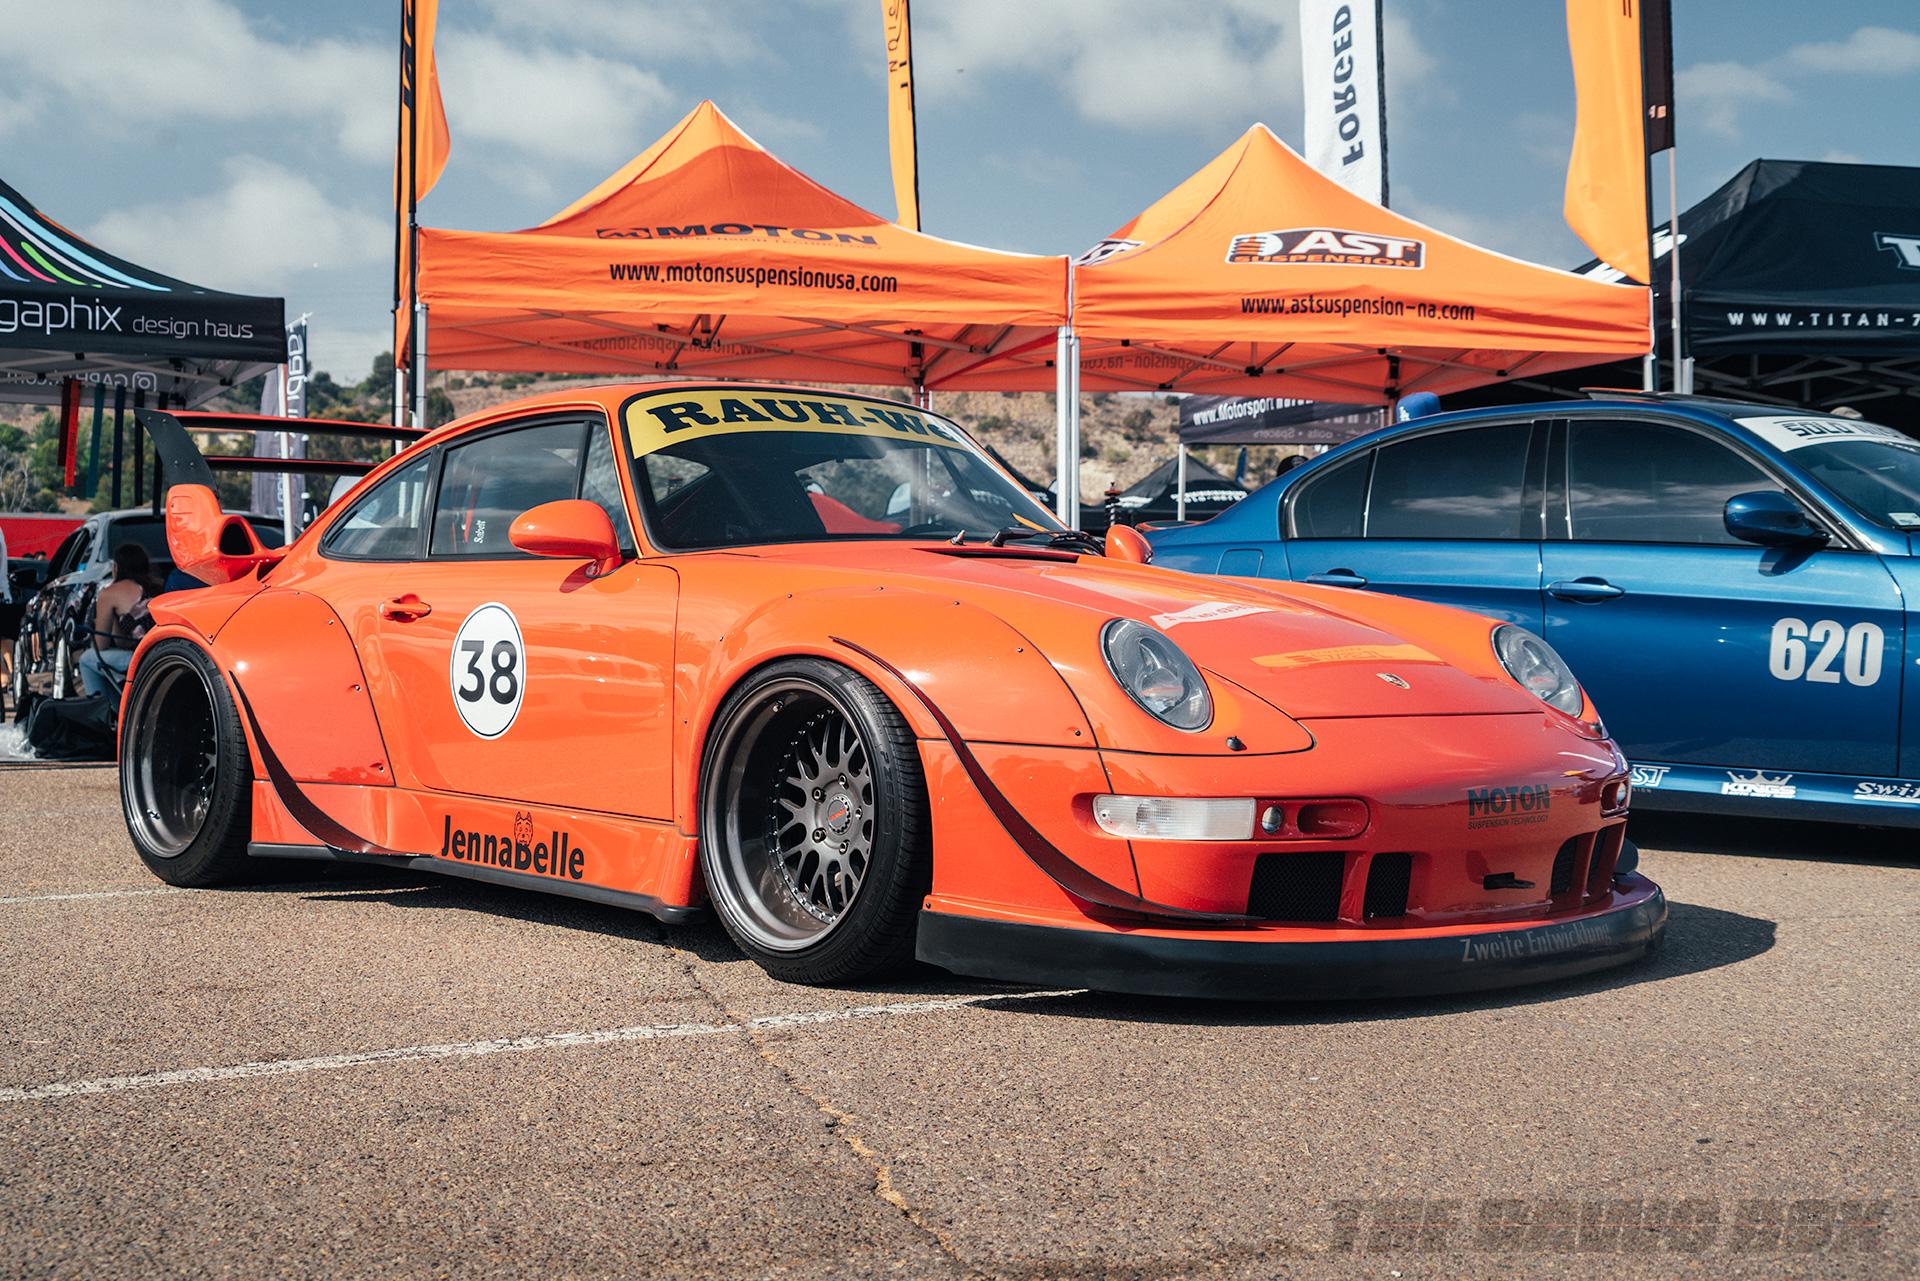 Orange Porsche 911 on display at Big Socal Euro